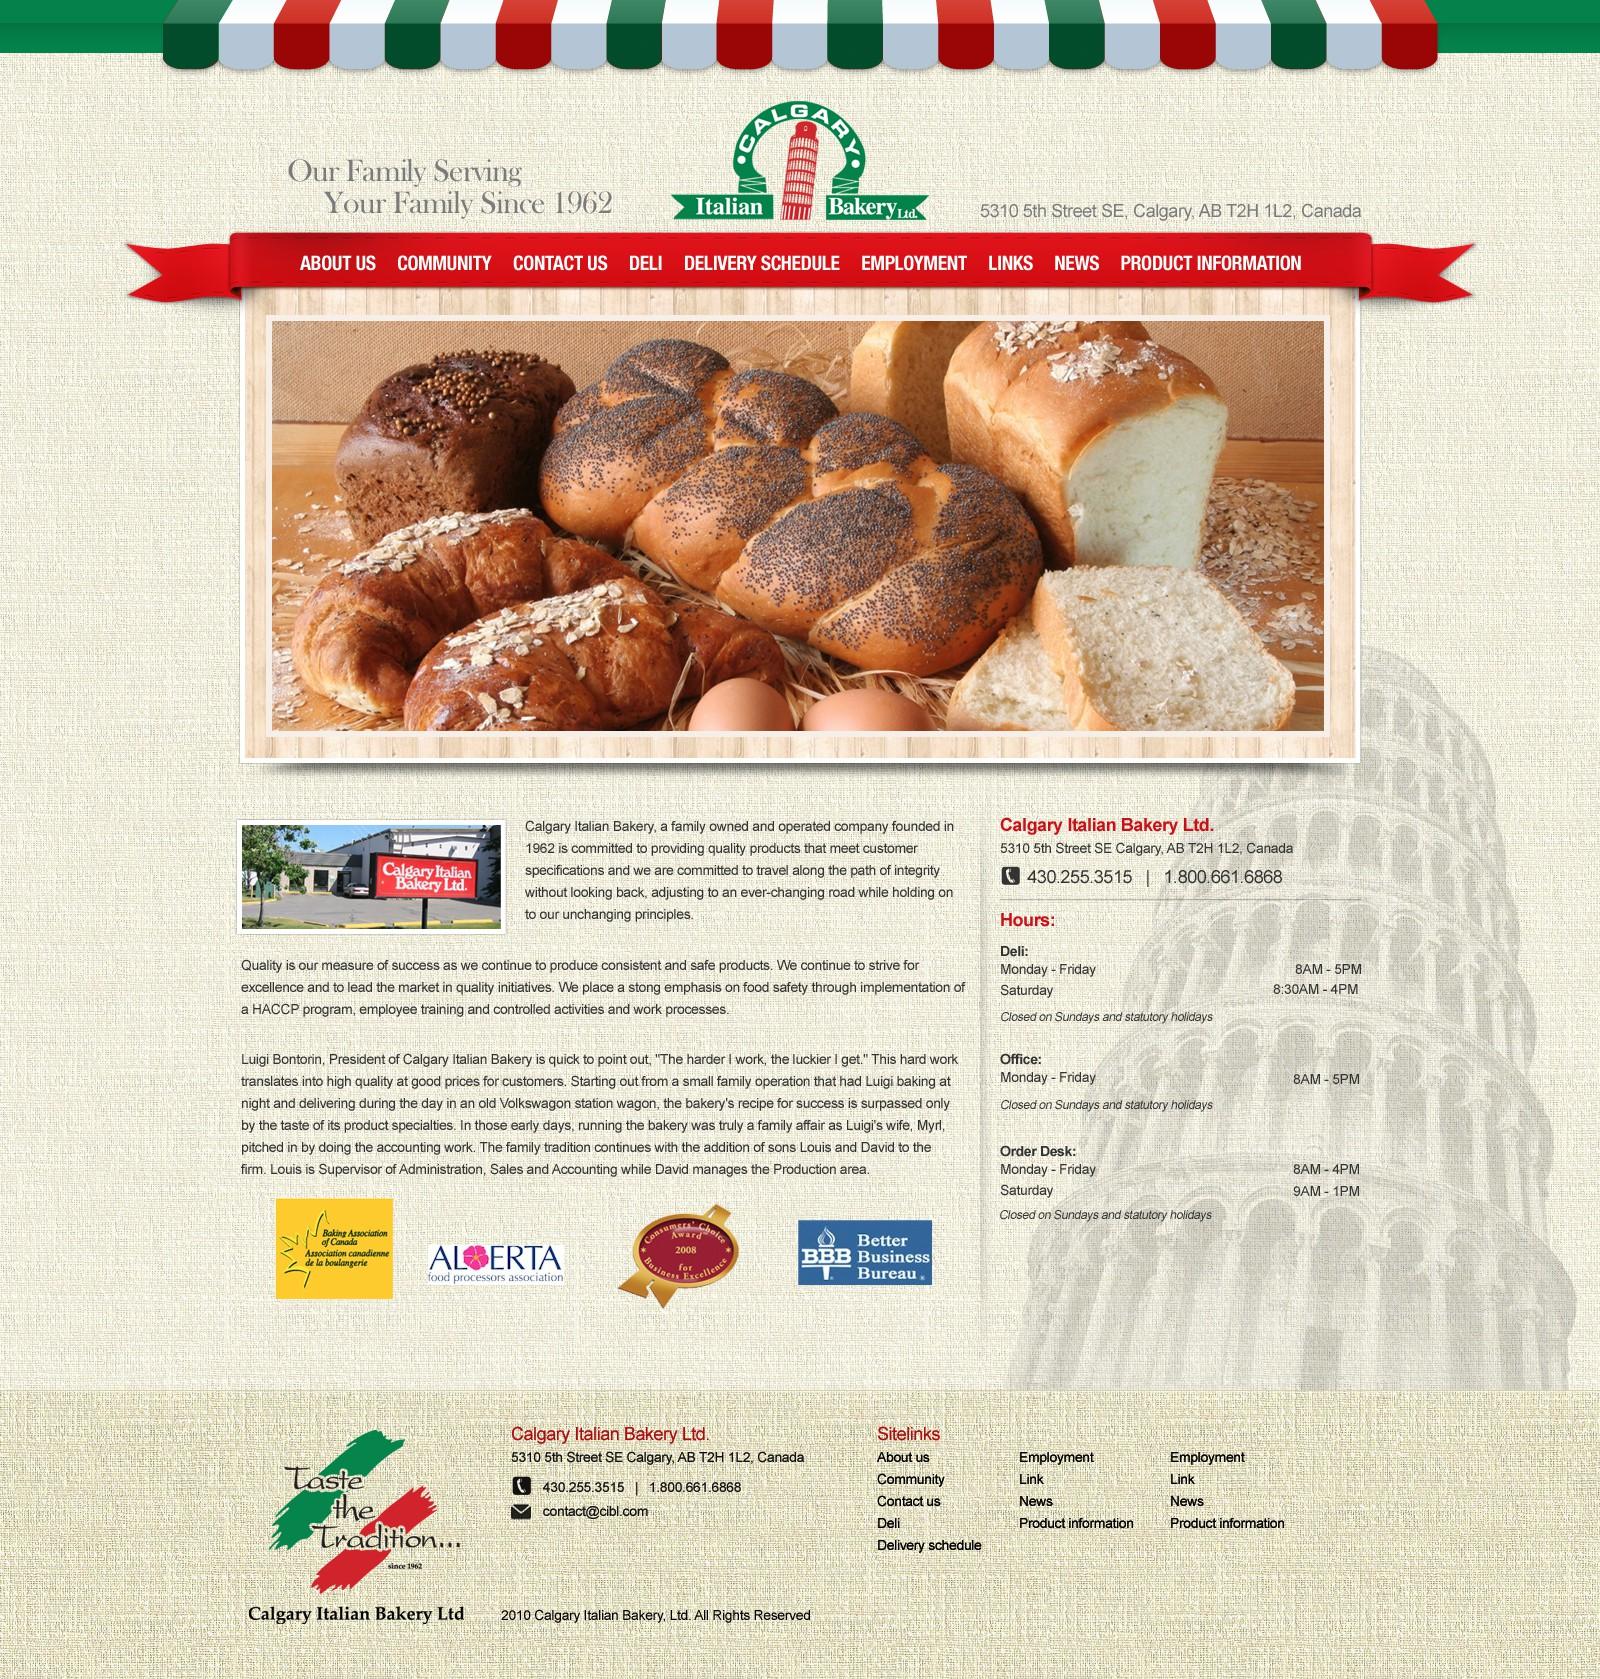 Italian Bakery (CIBL) needs a new website